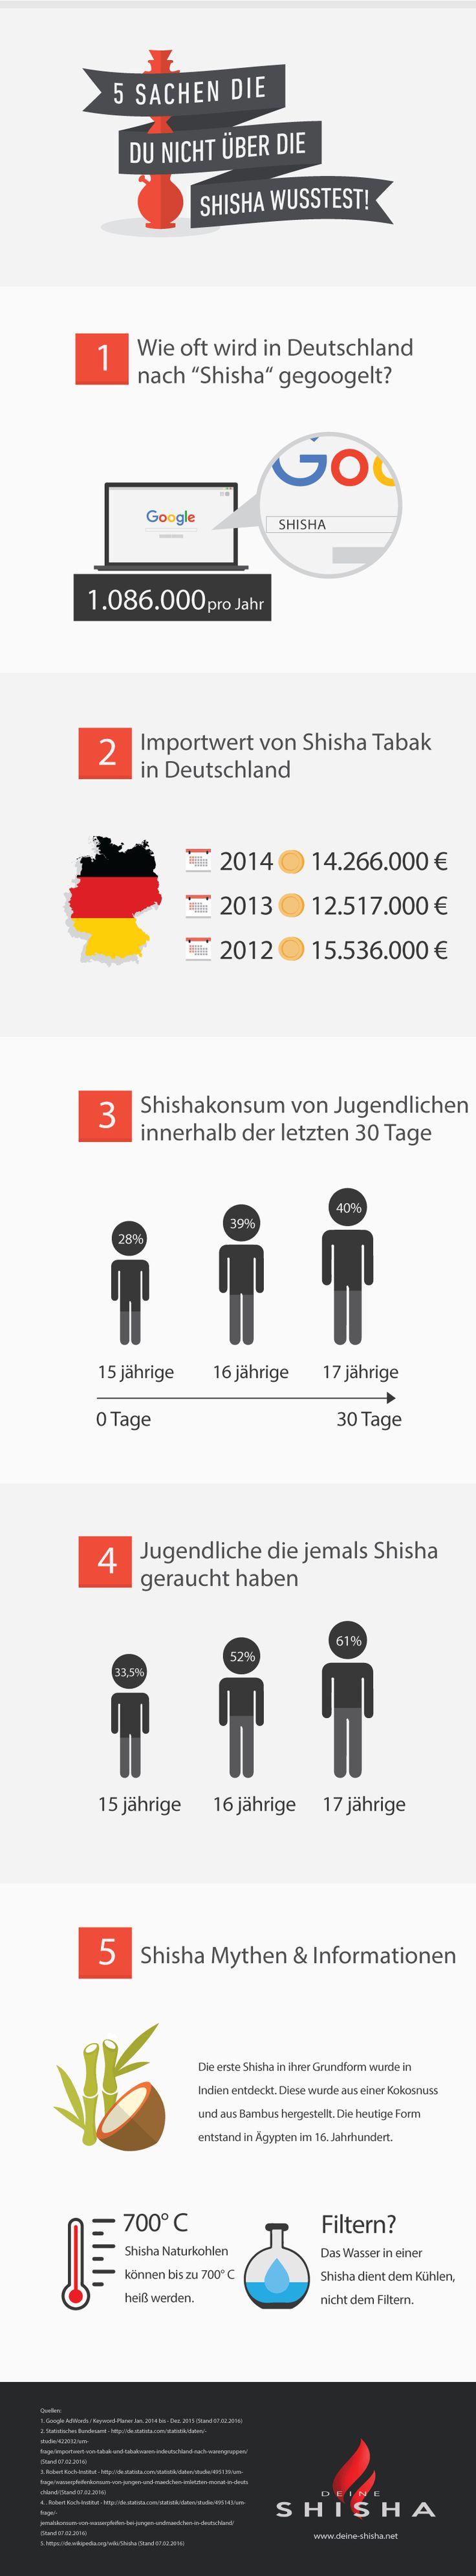 5 Fakten über die Shisha [Infografik]